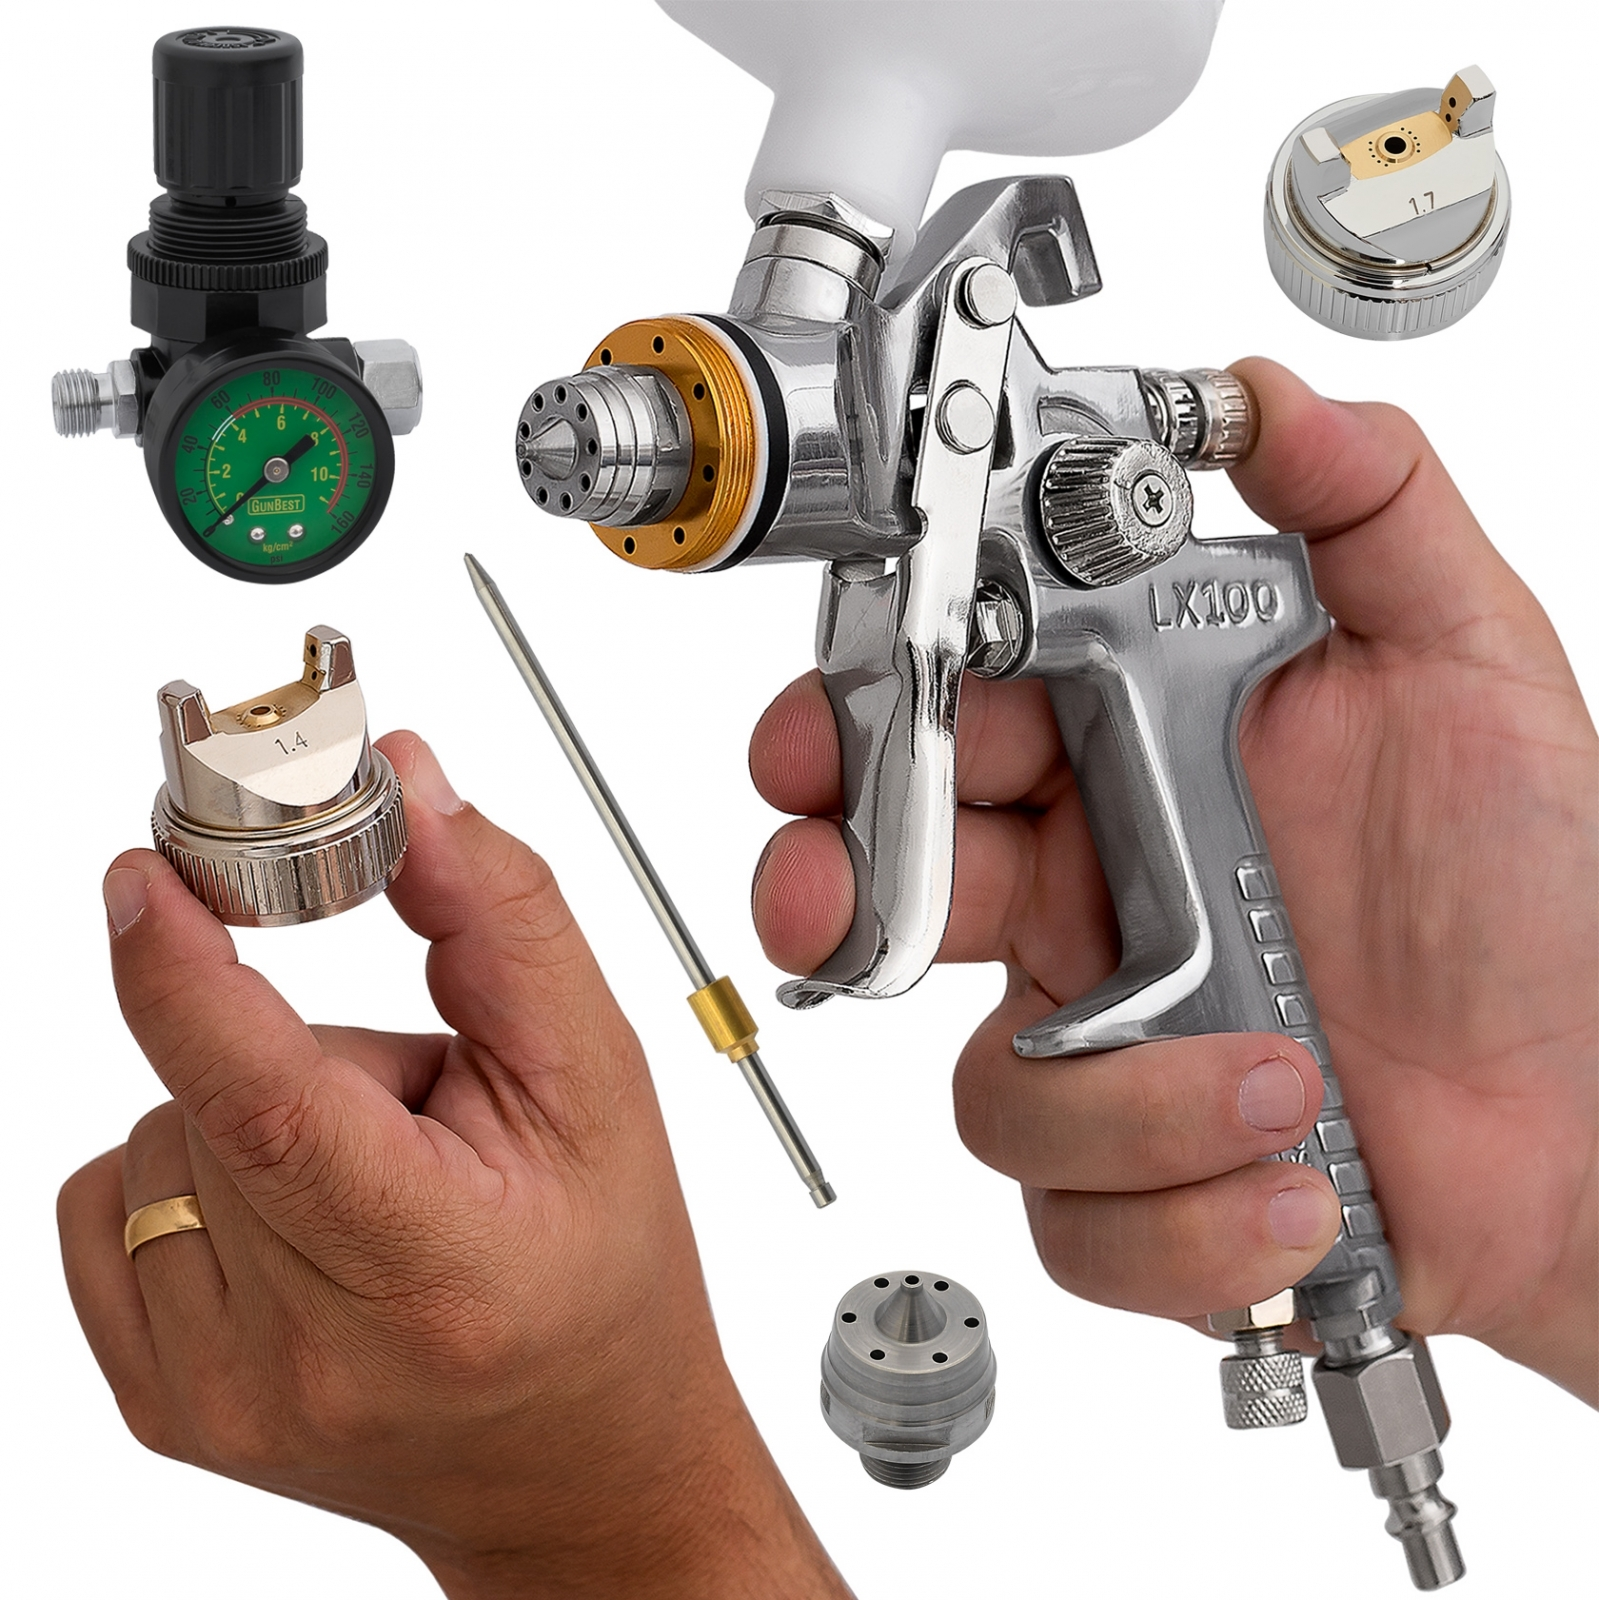 Pistola De Pintura Automotiva Hvlp Bico 1,4 + 1,7mm + manômetro Lx100m - Ferramentas MEP